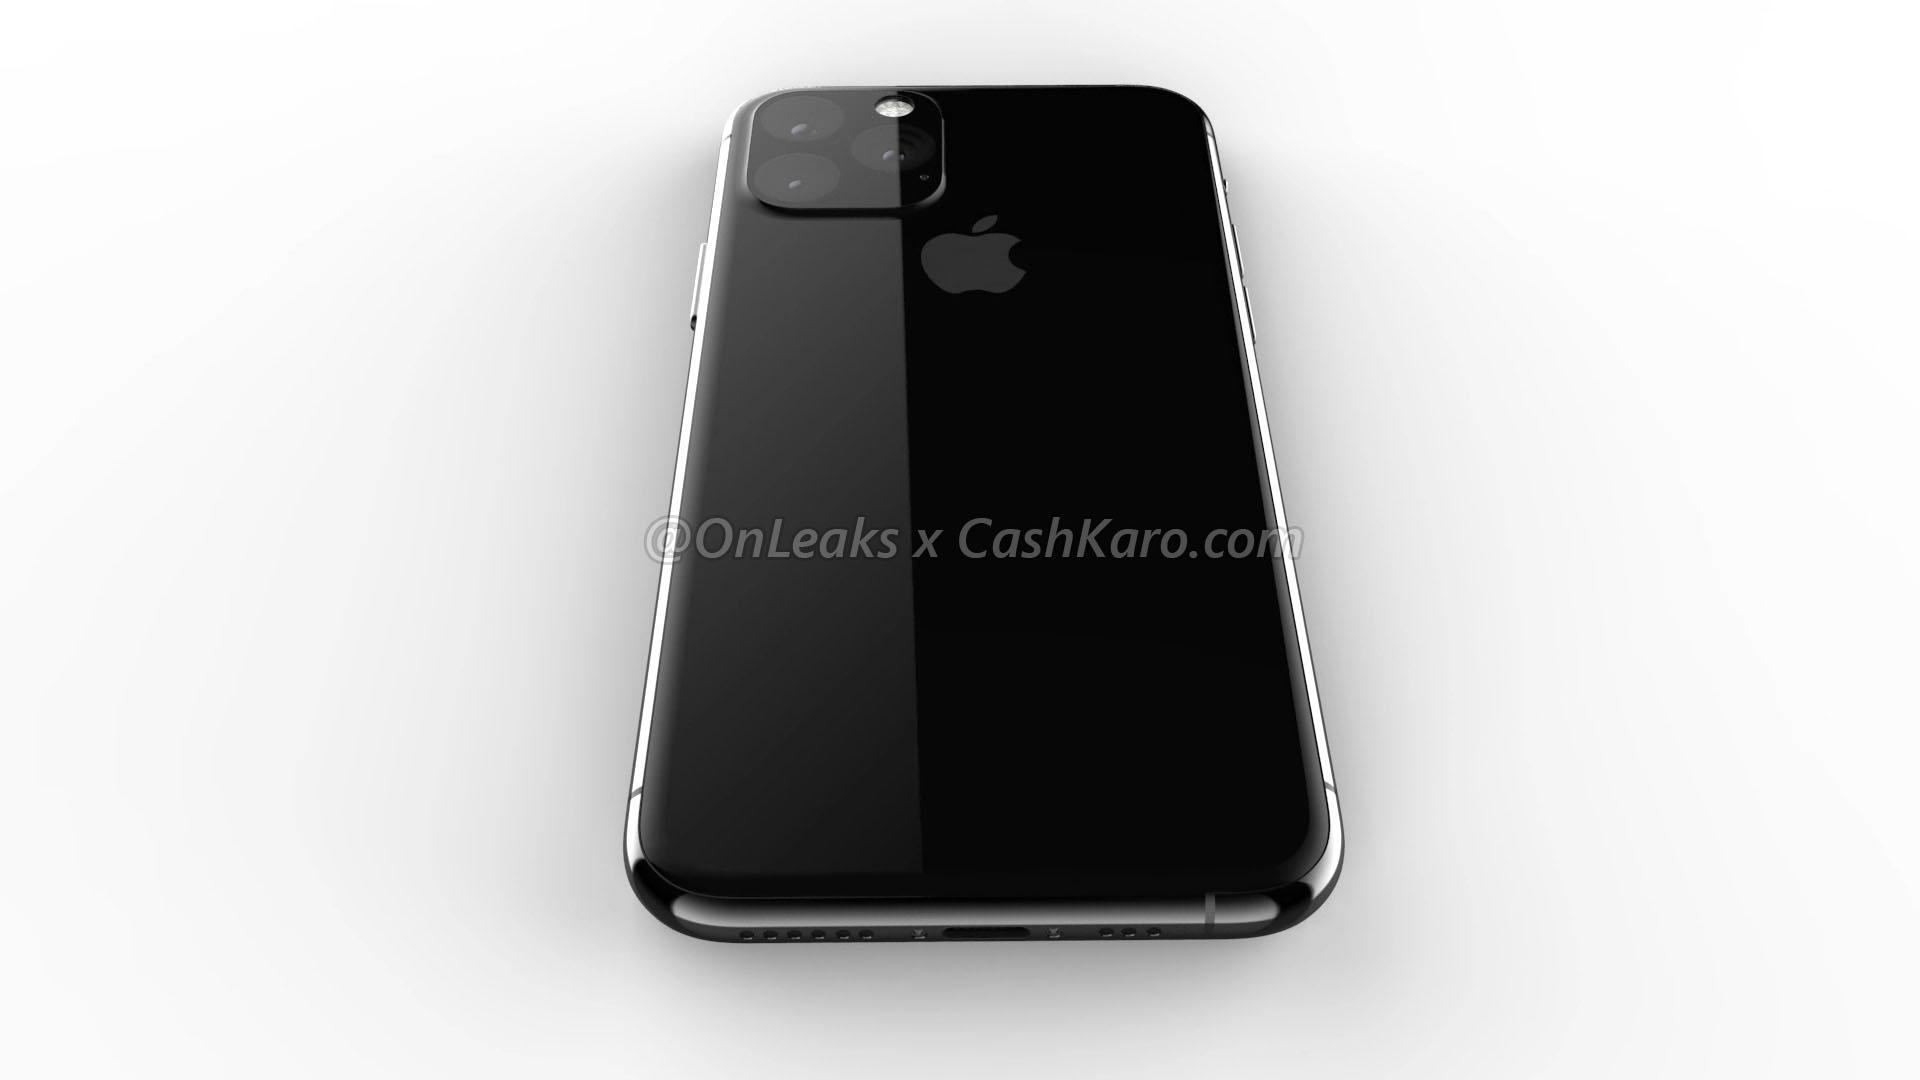 iPhone-XI-08 Cashkaro